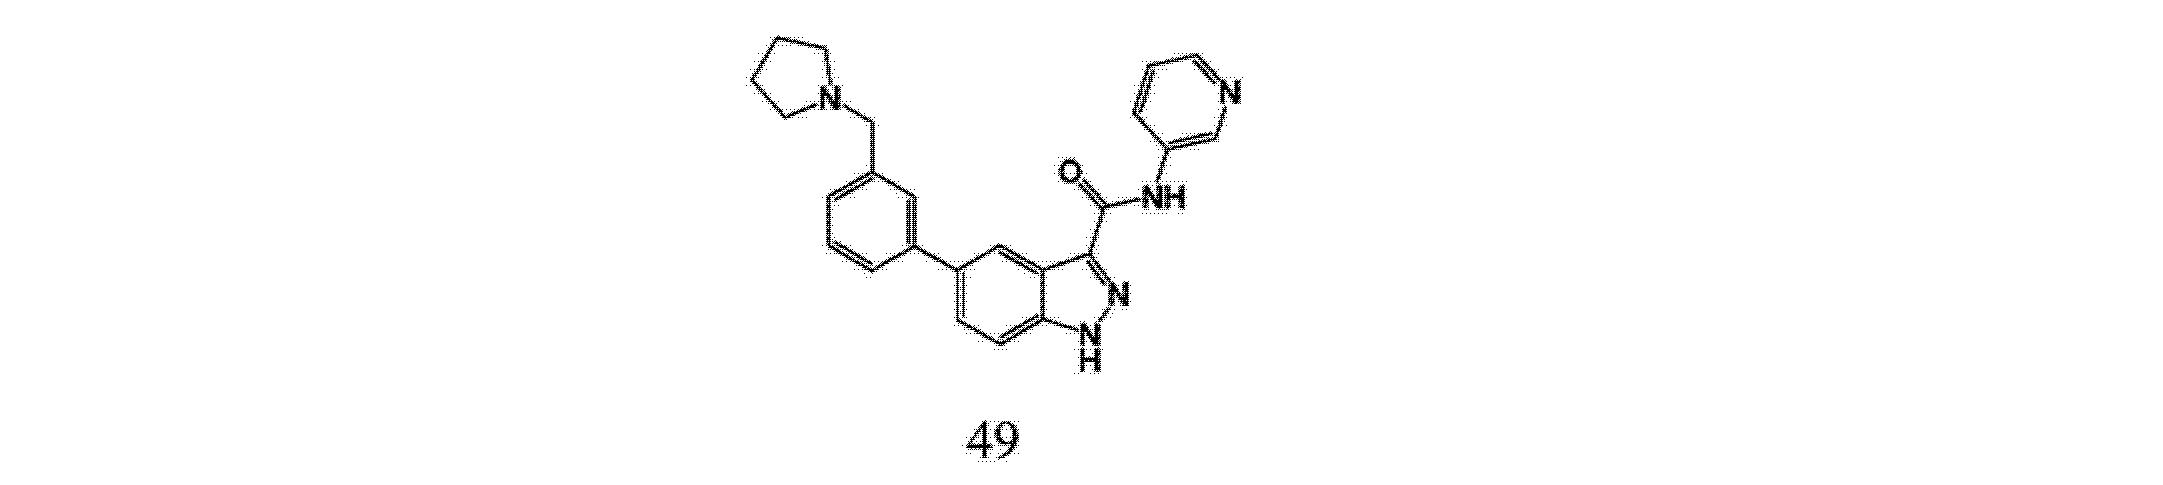 Figure CN103929963AD01841